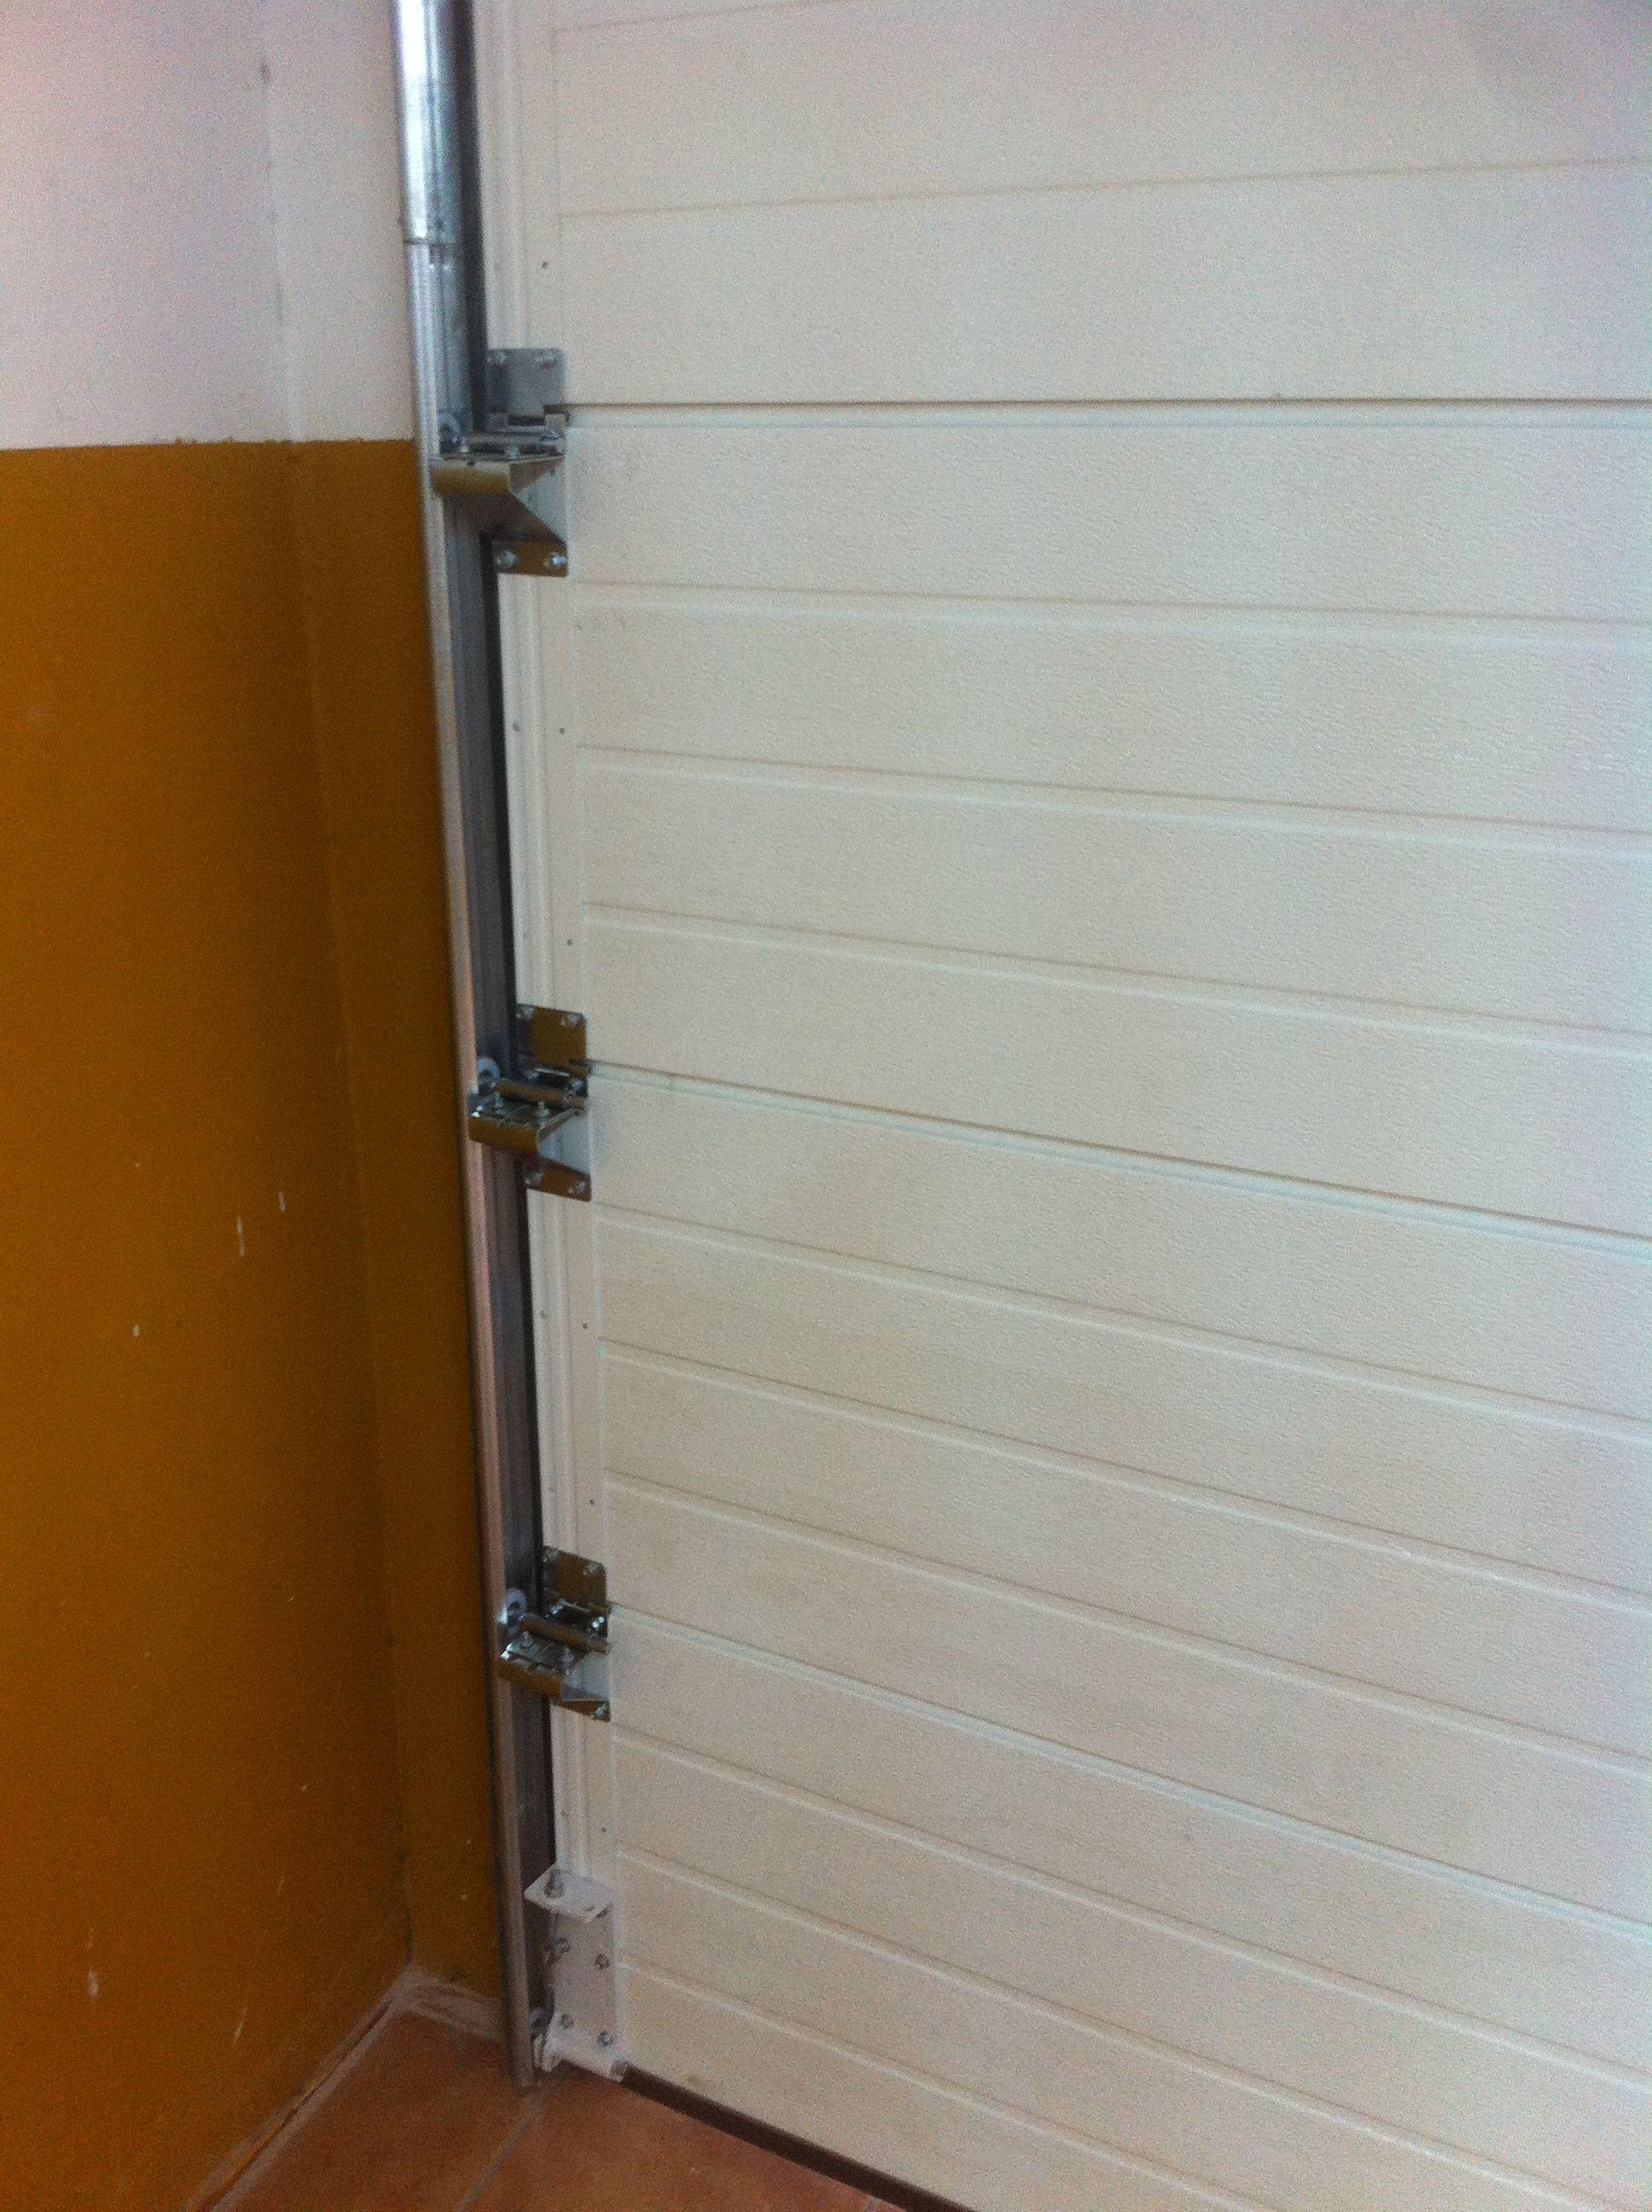 Puerta seccional de garaje cat logo de jgm aluminio for Catalogo de puertas de aluminio